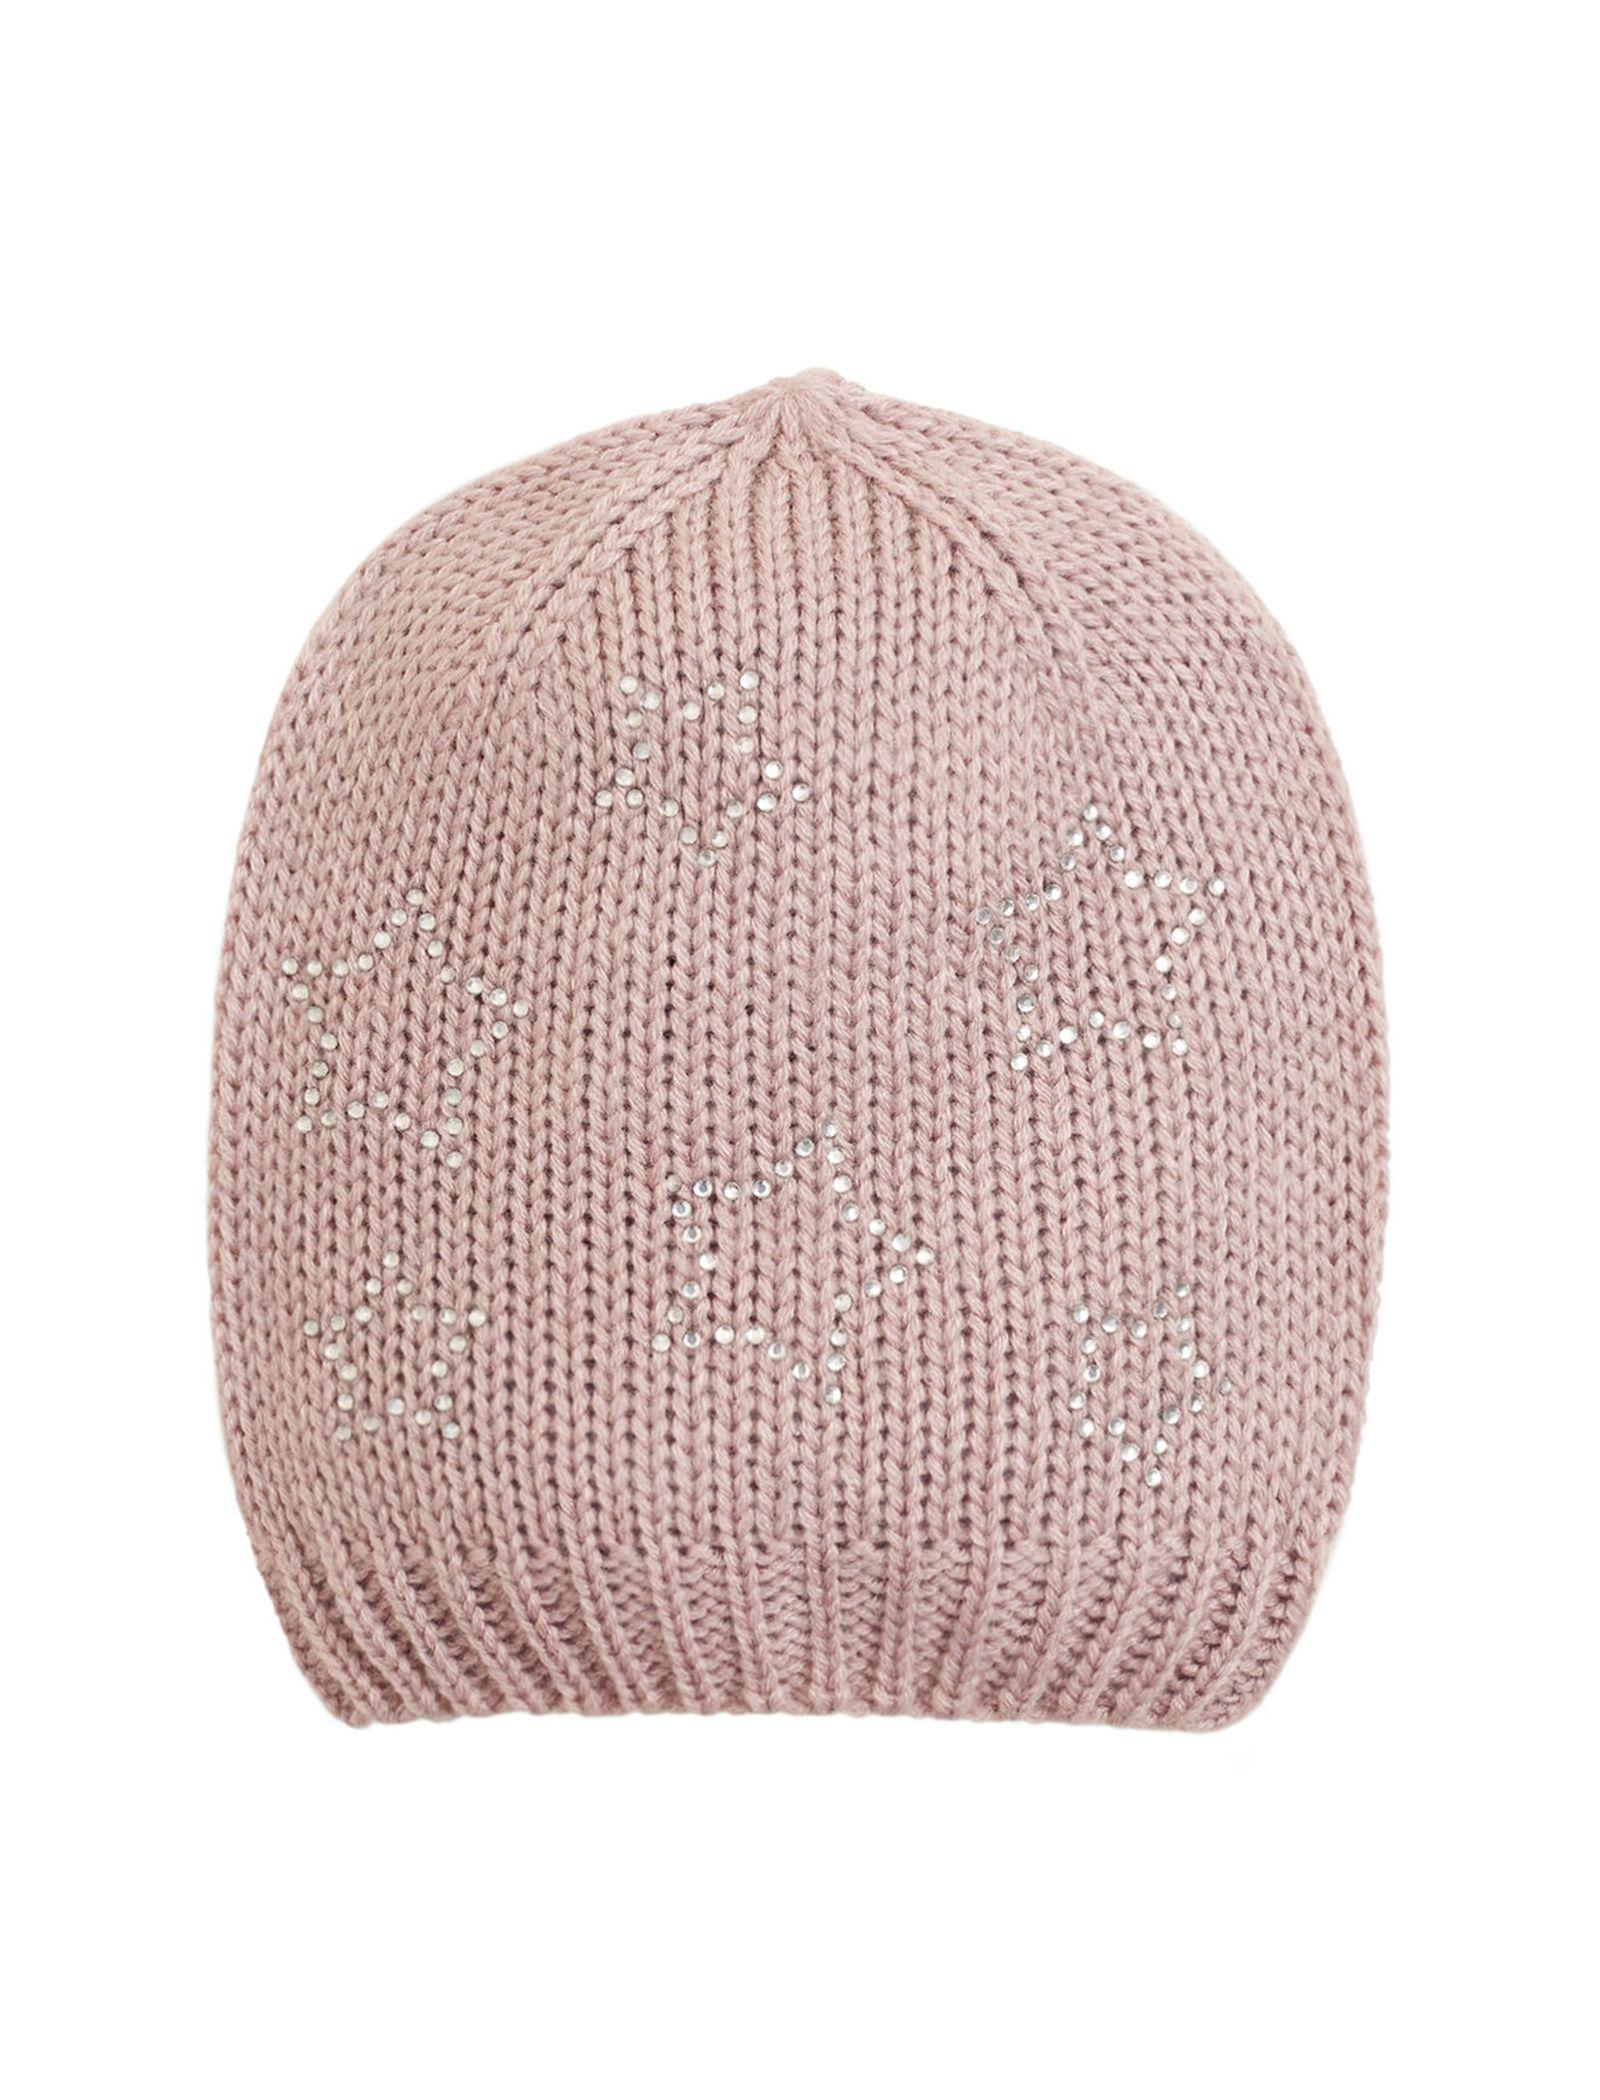 کلاه زمستانی دخترانه - مانگو - صورتي - 1